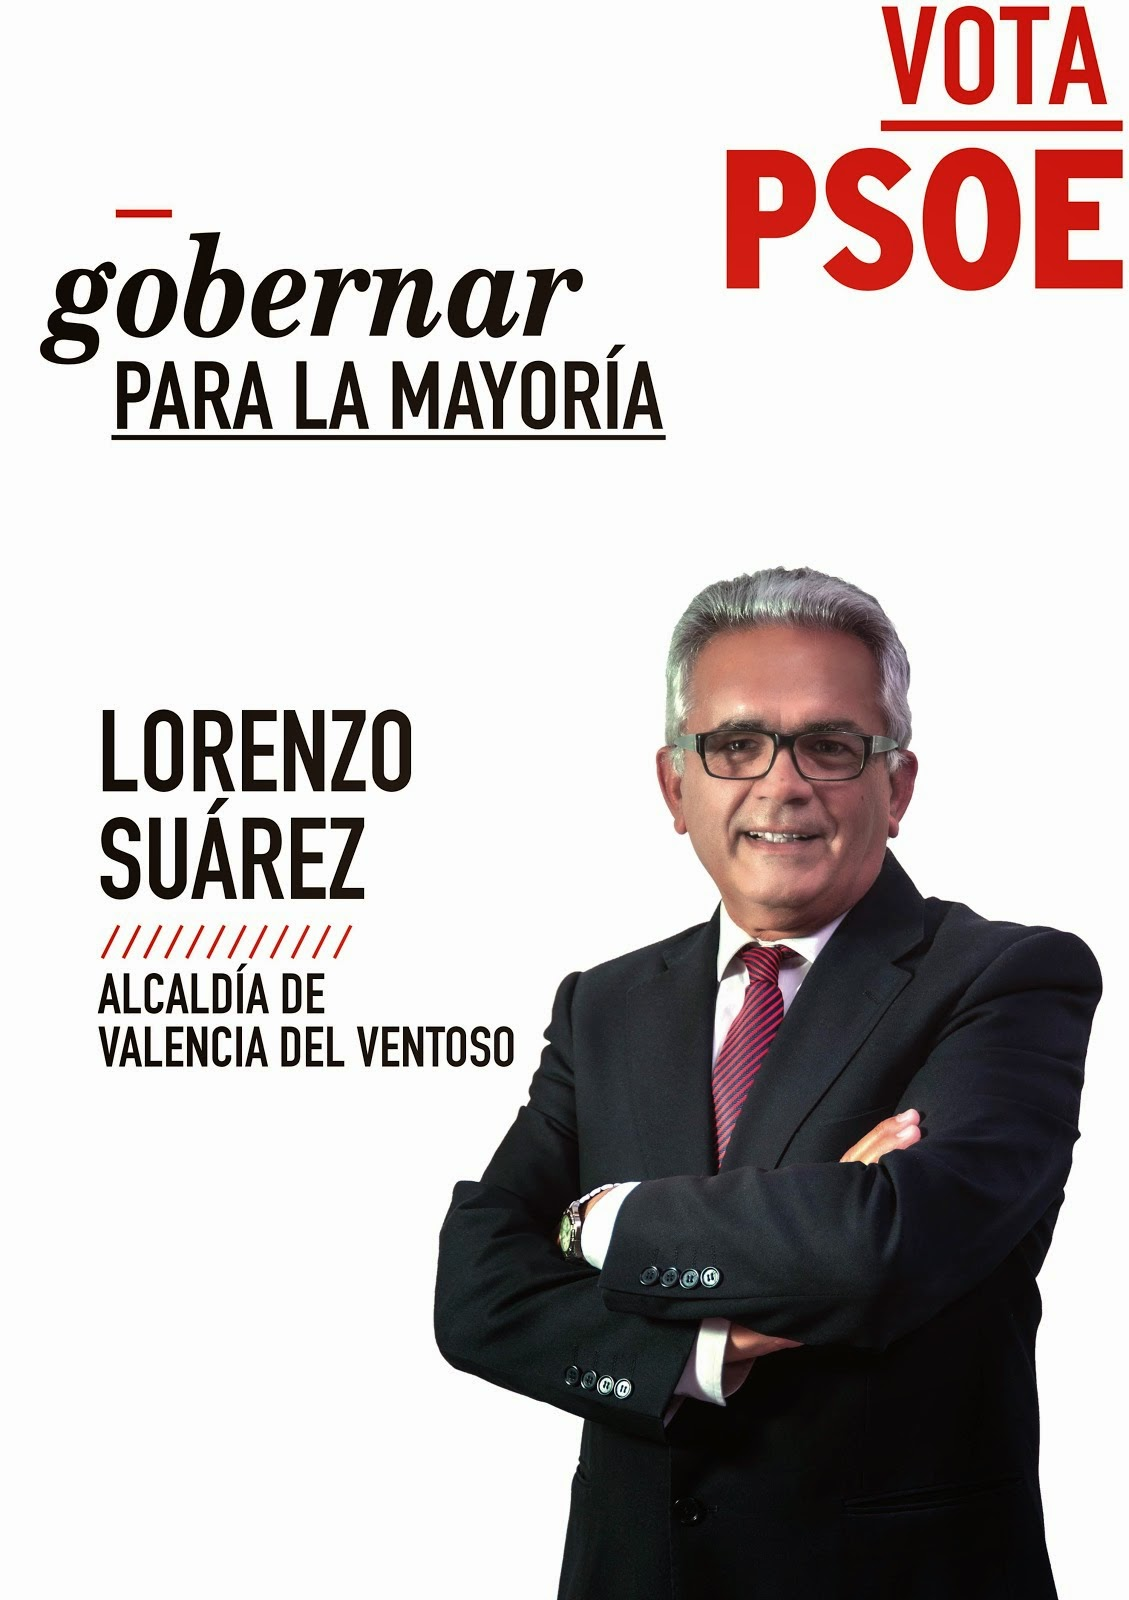 Cartel candidato campaña mayo 2015